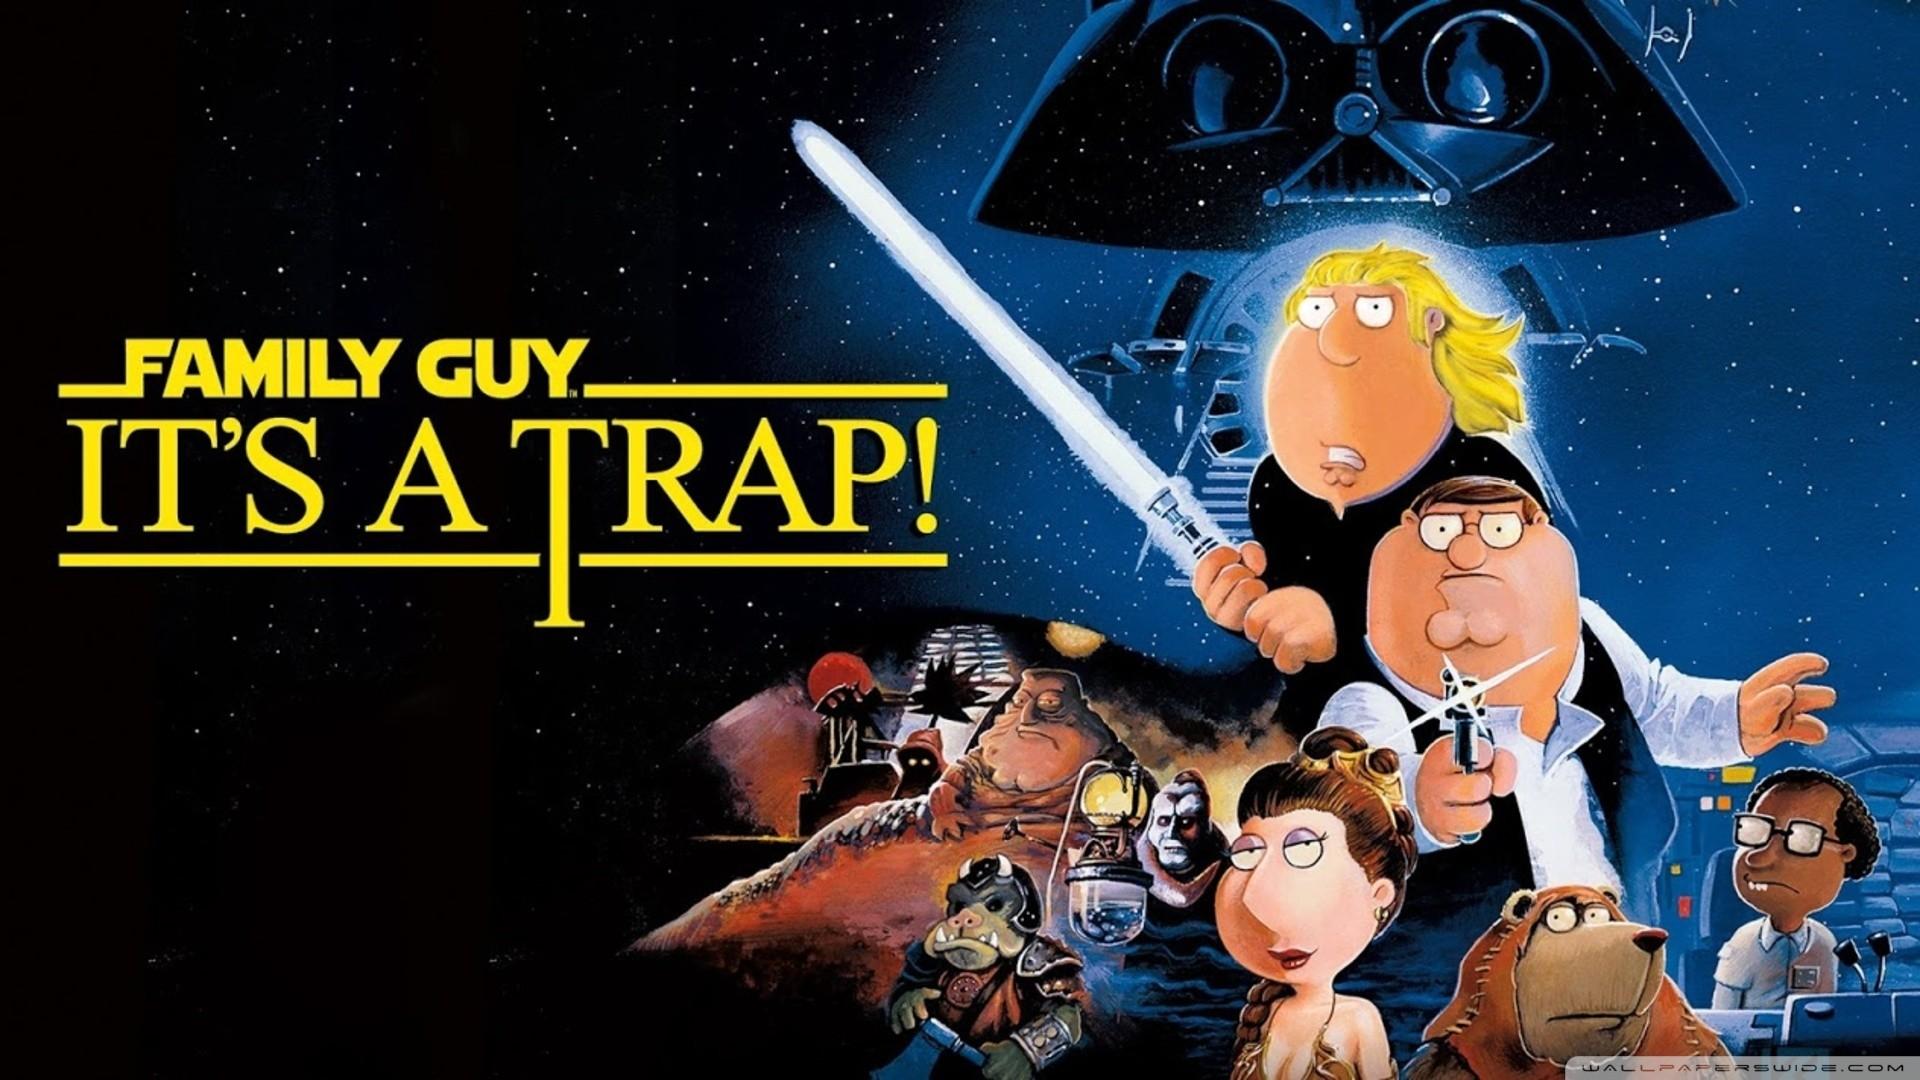 Mobile Data Src Download Family Guy Star Wars Wallpaper 1920x1080 Wallpaper Teahub Io